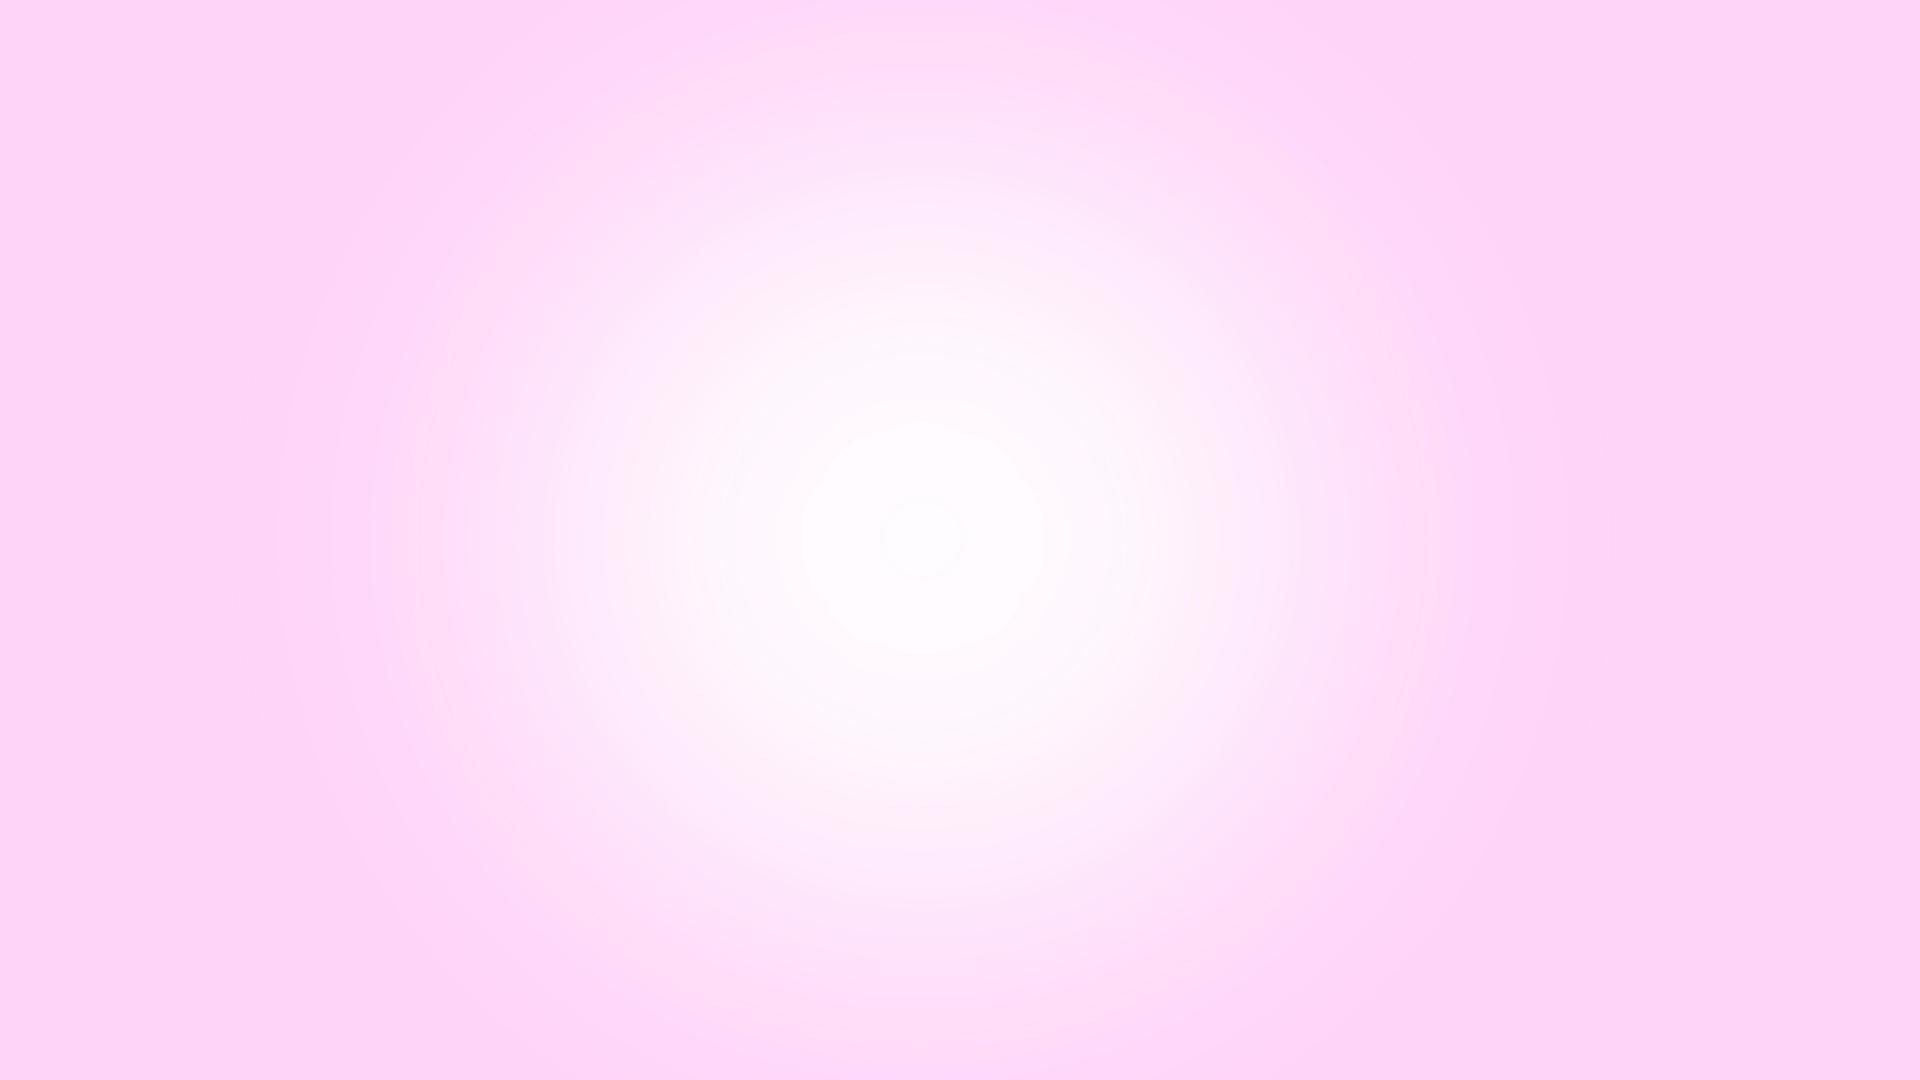 high-definition-light-pink-wallpapers - wallpaper.wiki